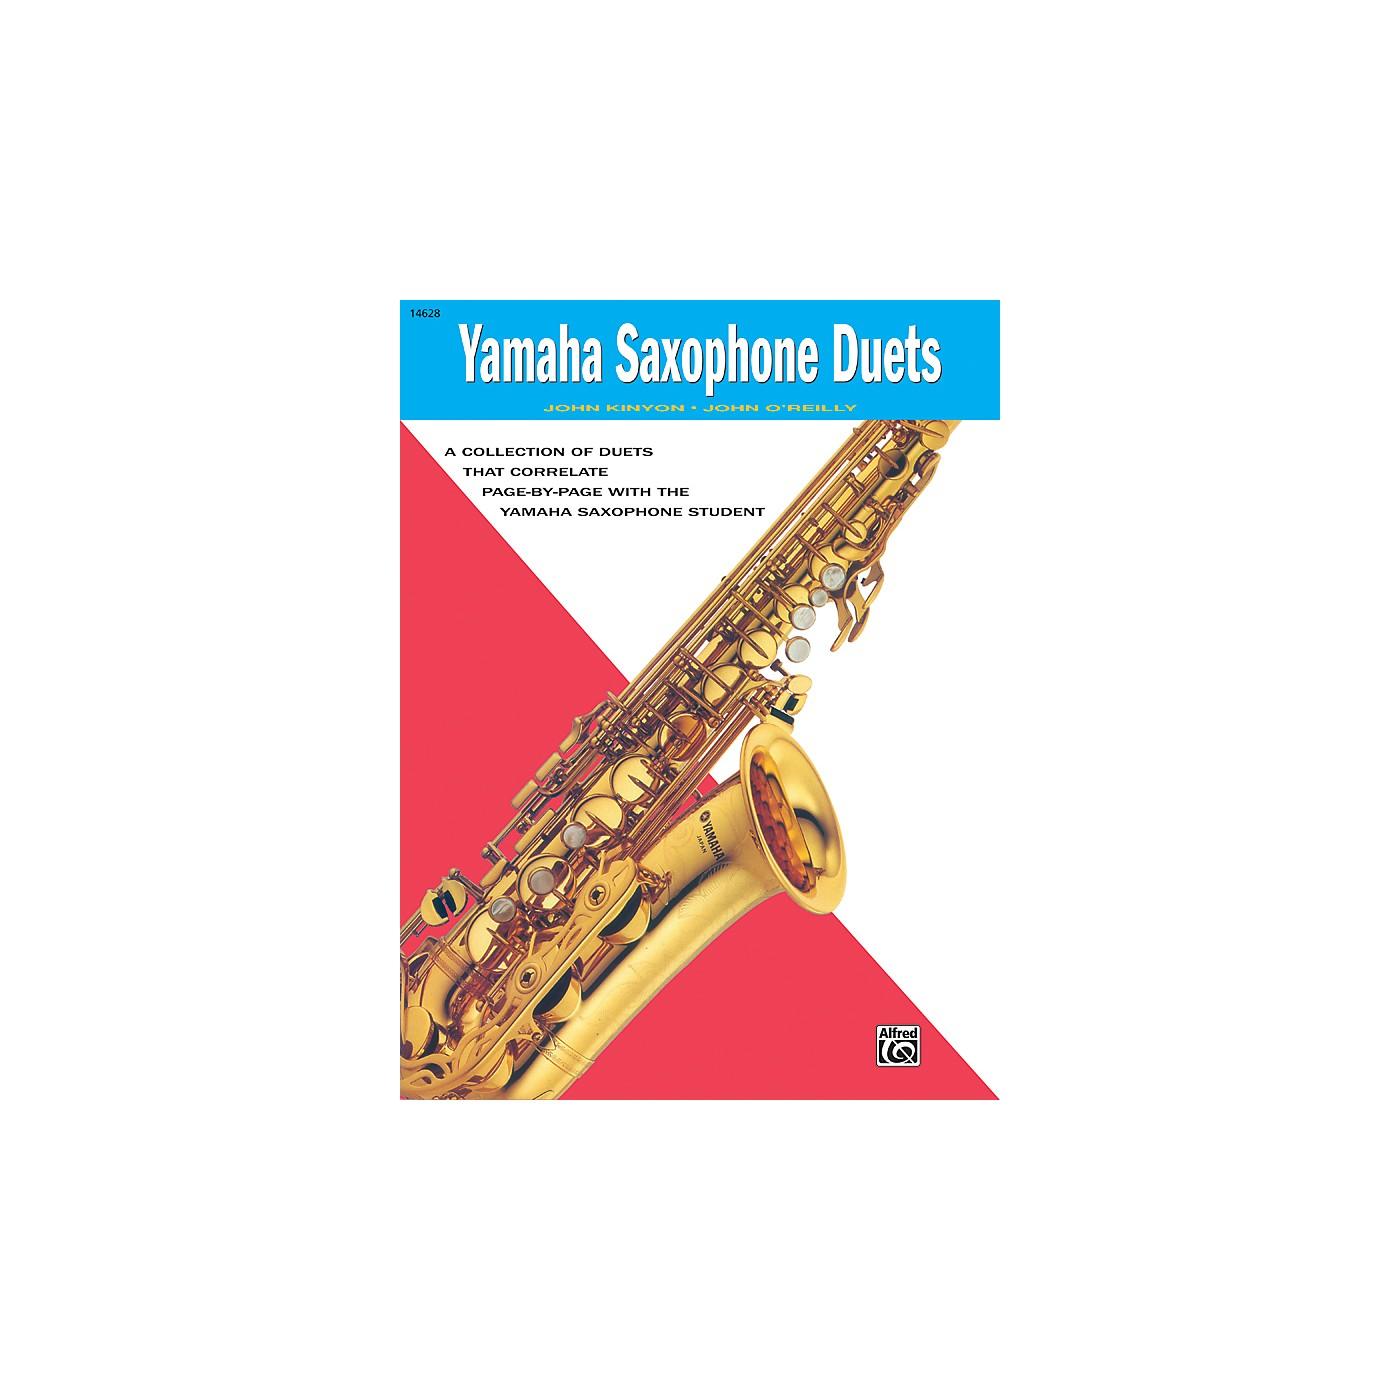 Alfred Yamaha E-Flat Alto Saxophone Duets Book thumbnail